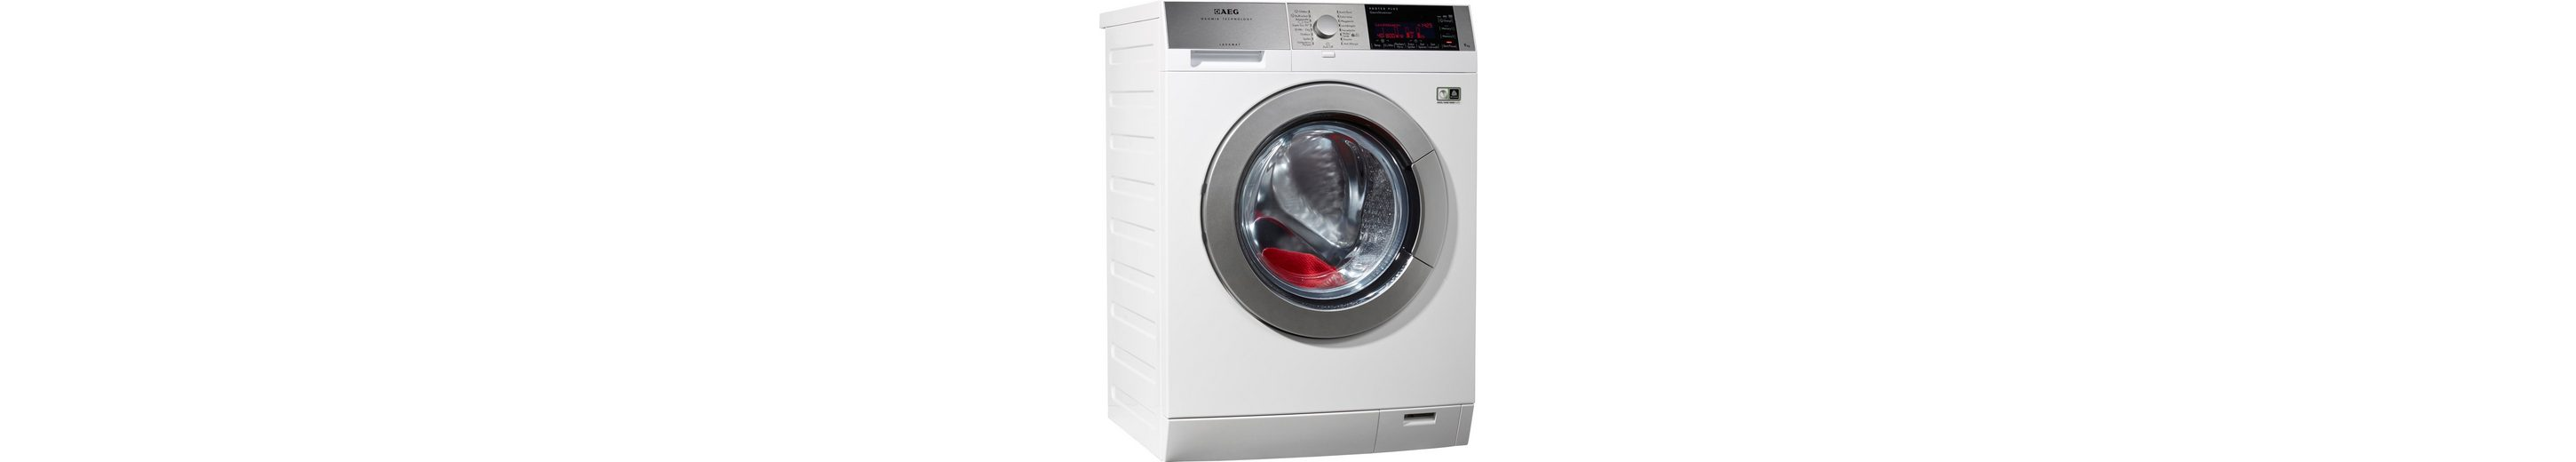 AEG Waschmaschine LAVAMAT L99695FL, A+++, 9 kg, 1600 U/Min